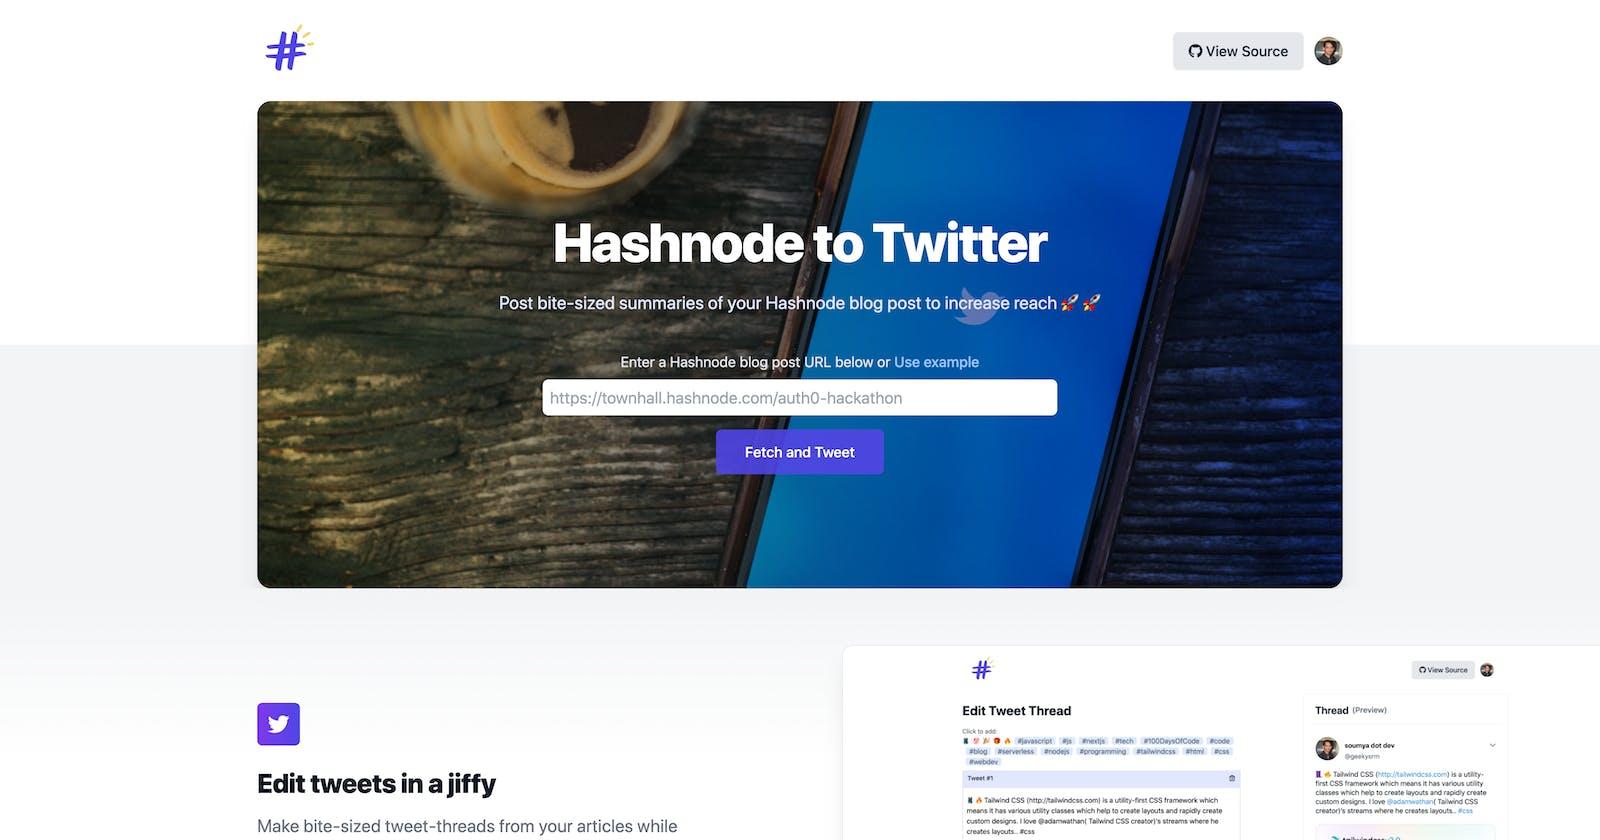 Introducing Hashnode to Twitter